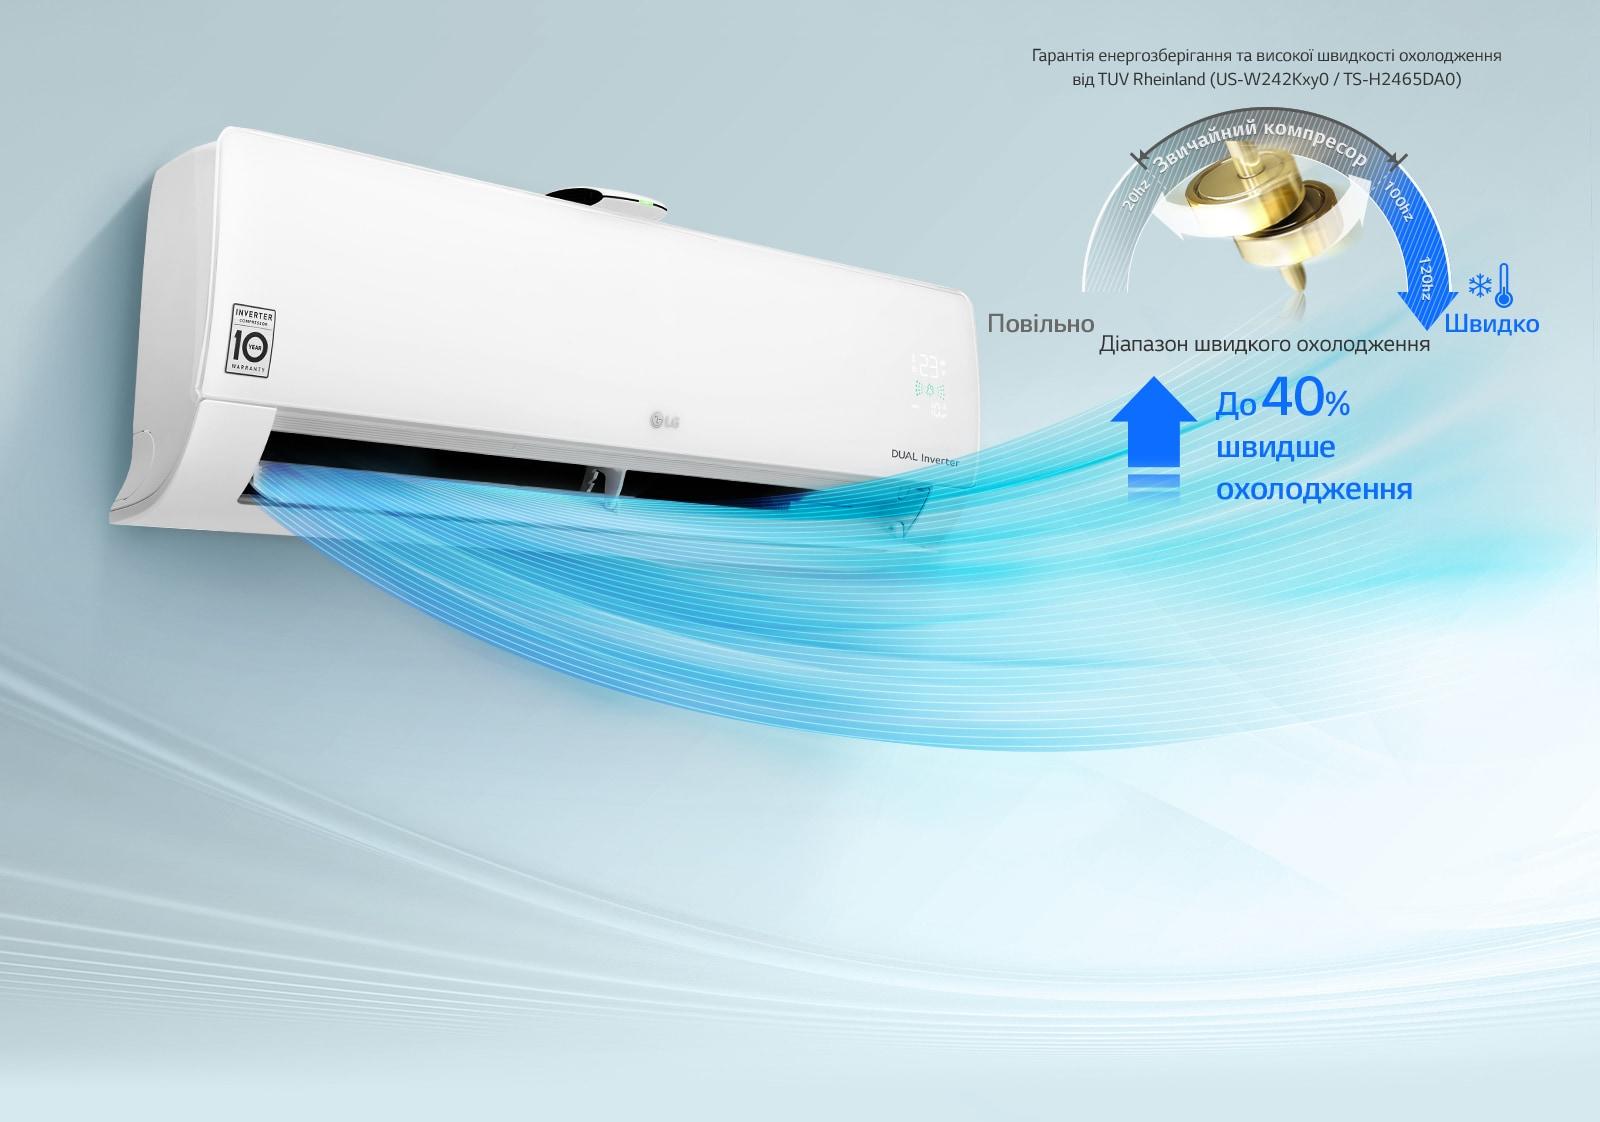 RAC EU DUALCOOL AirPurification 05 1 Fast Cooling D - LG  AP12RT